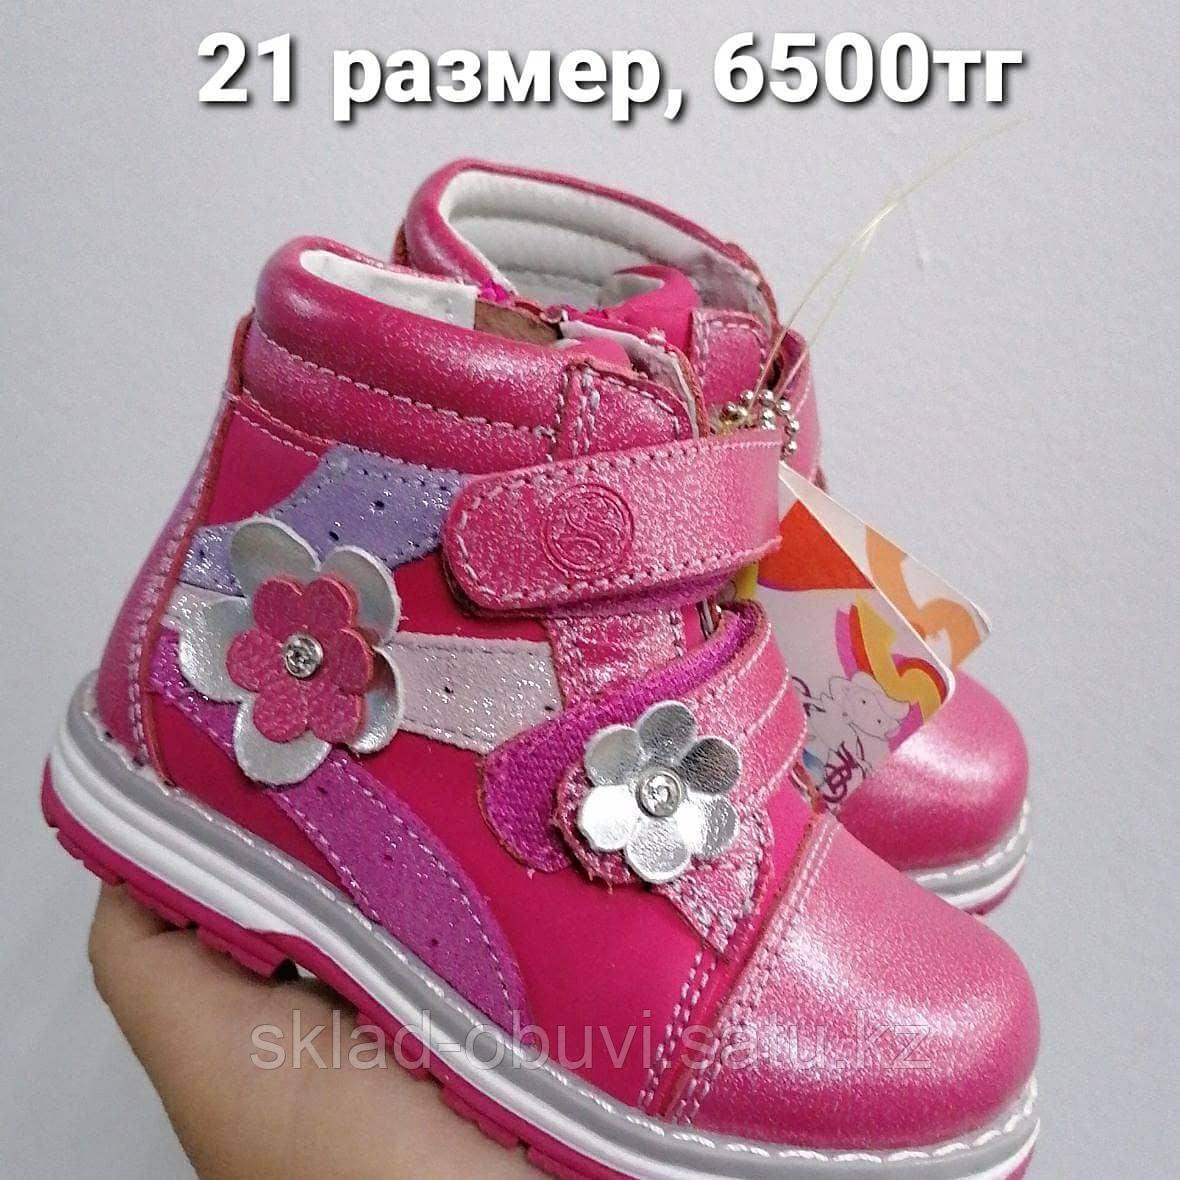 Flamingo. Ботинки детям. - фото 1